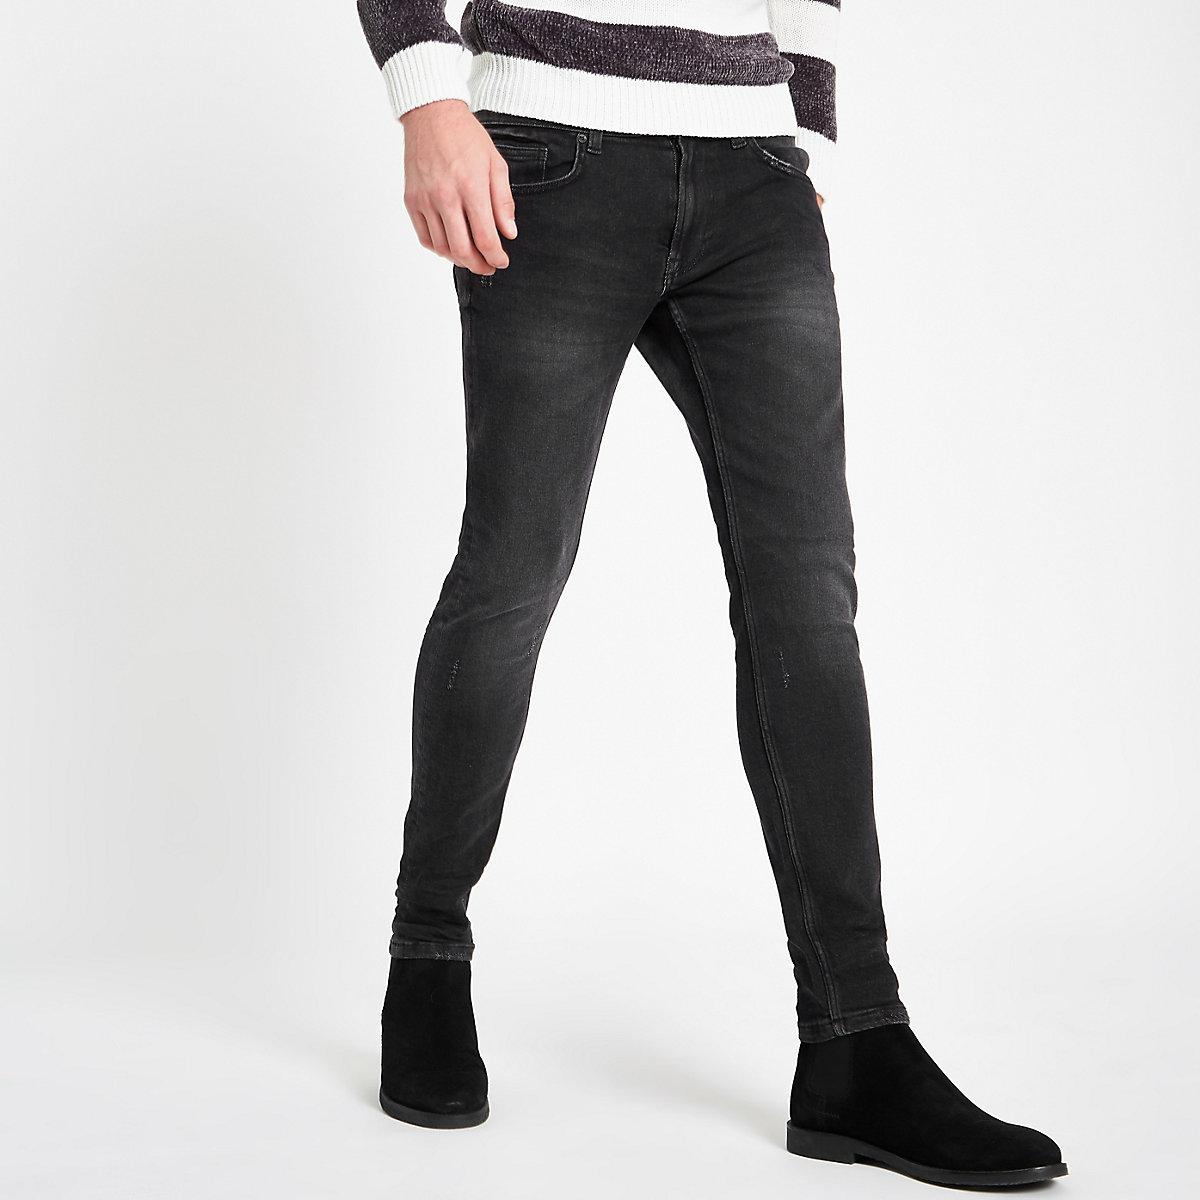 Only & Sons black wash slim fit jeans